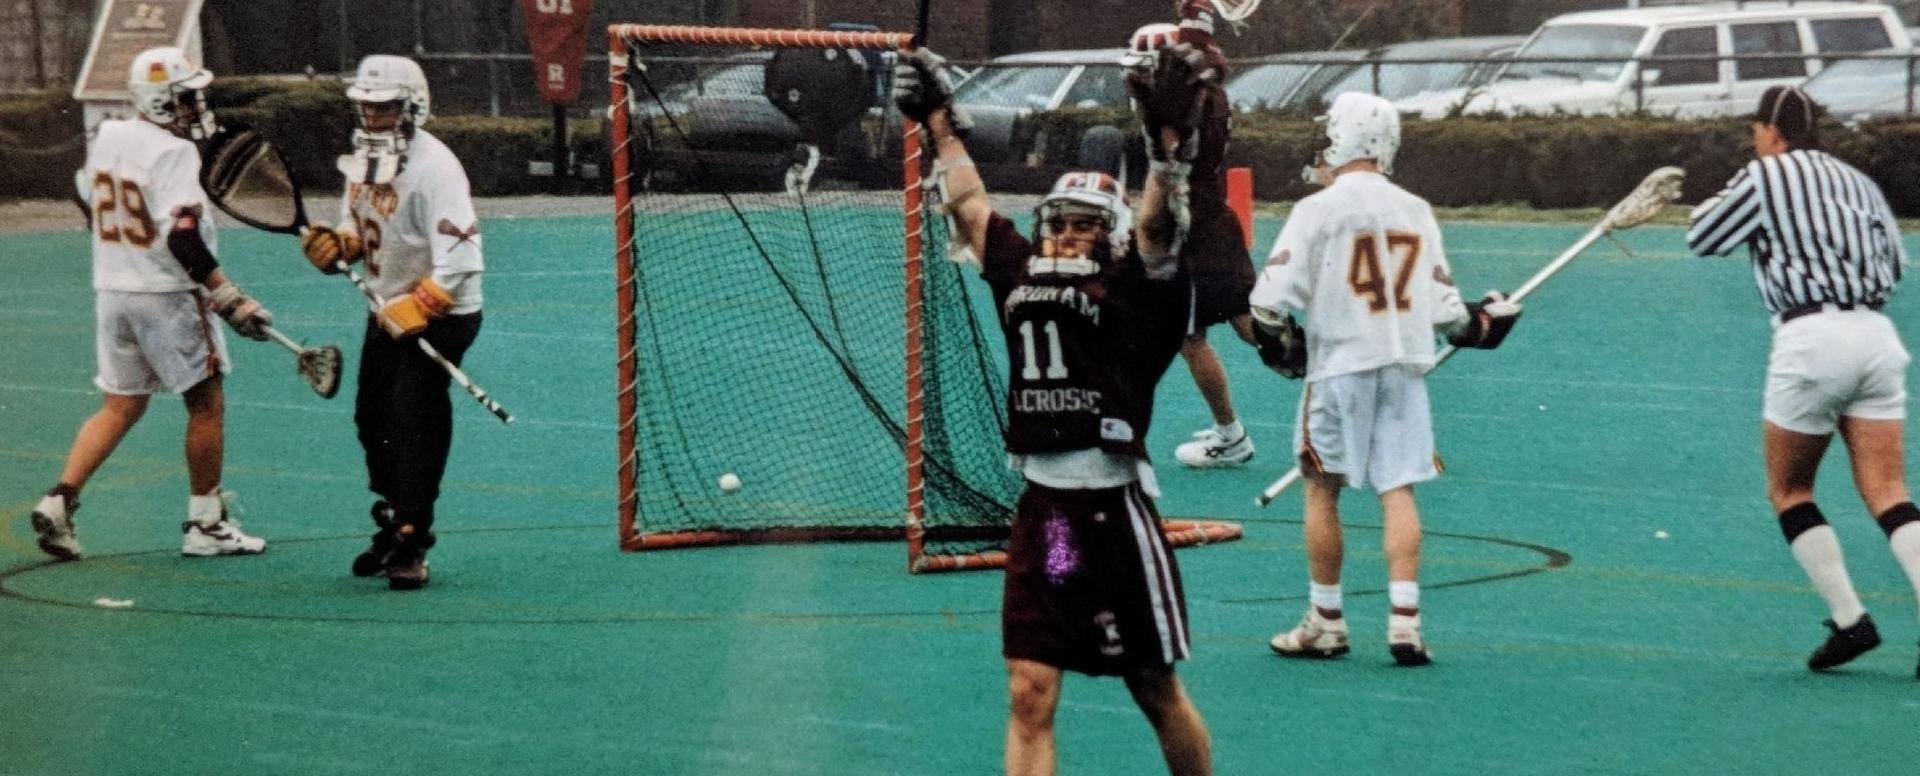 Tom Maxwell '95